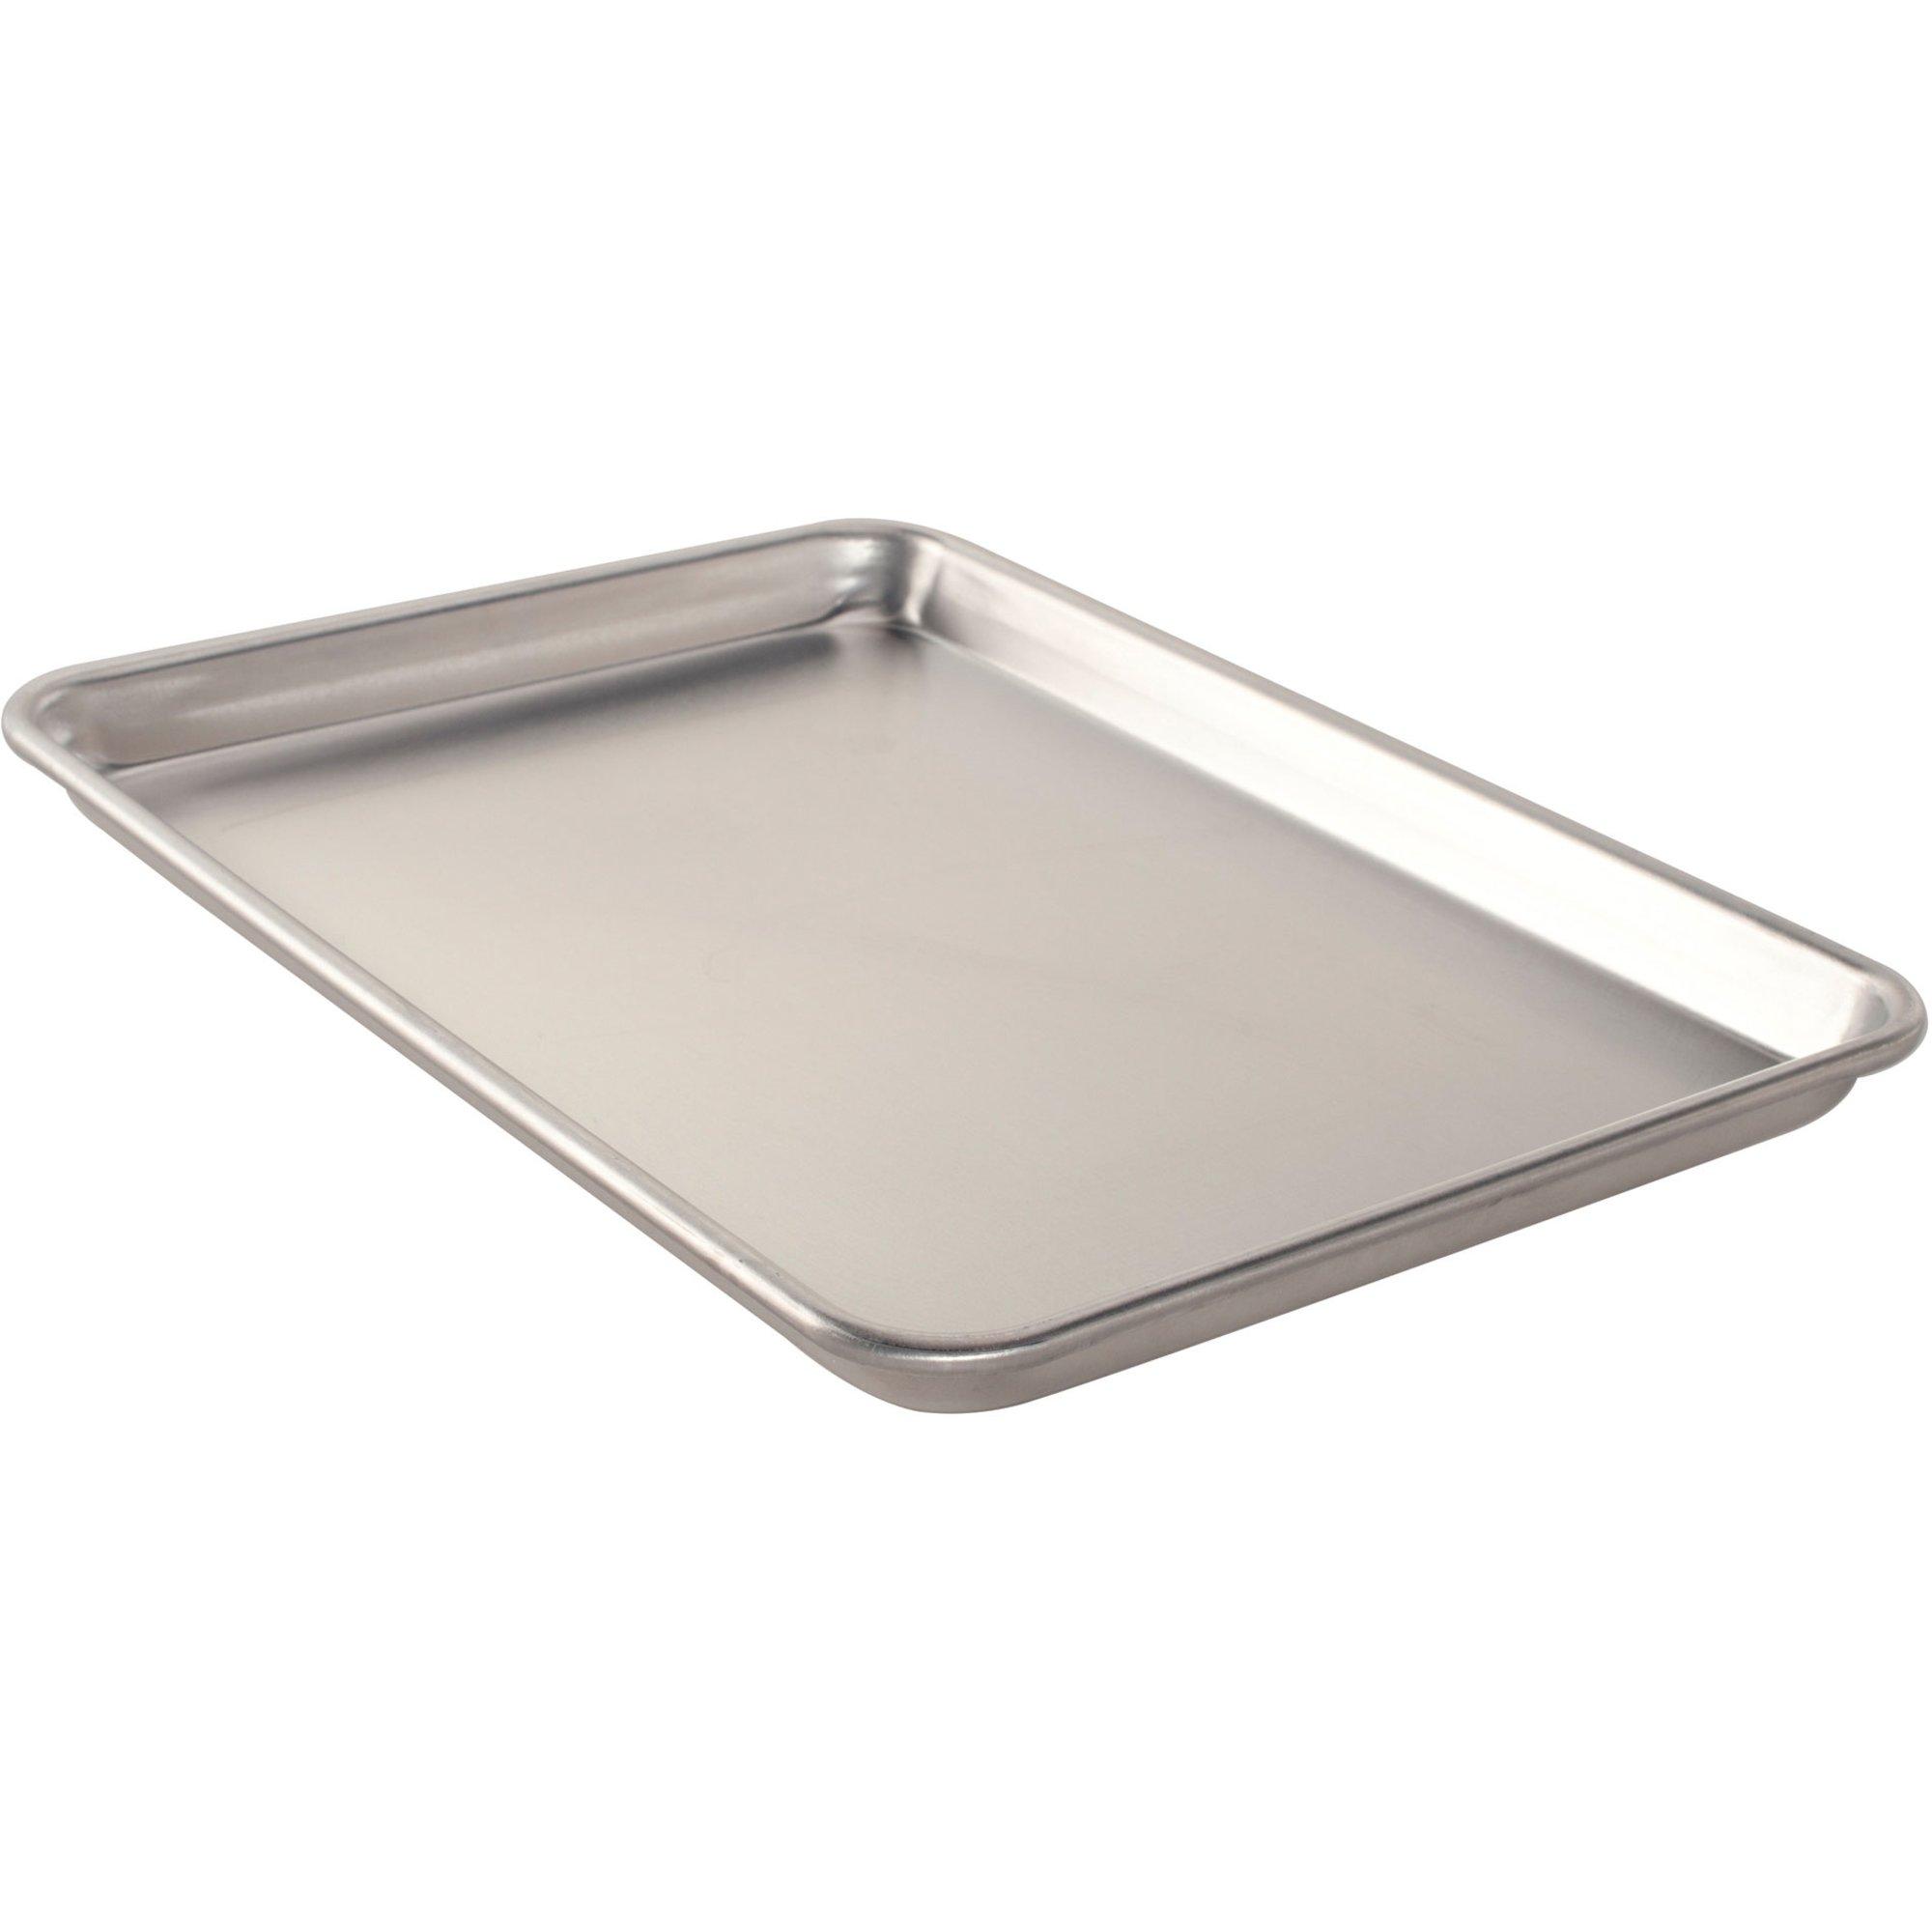 Nordic Ware Bradepande i aluminium